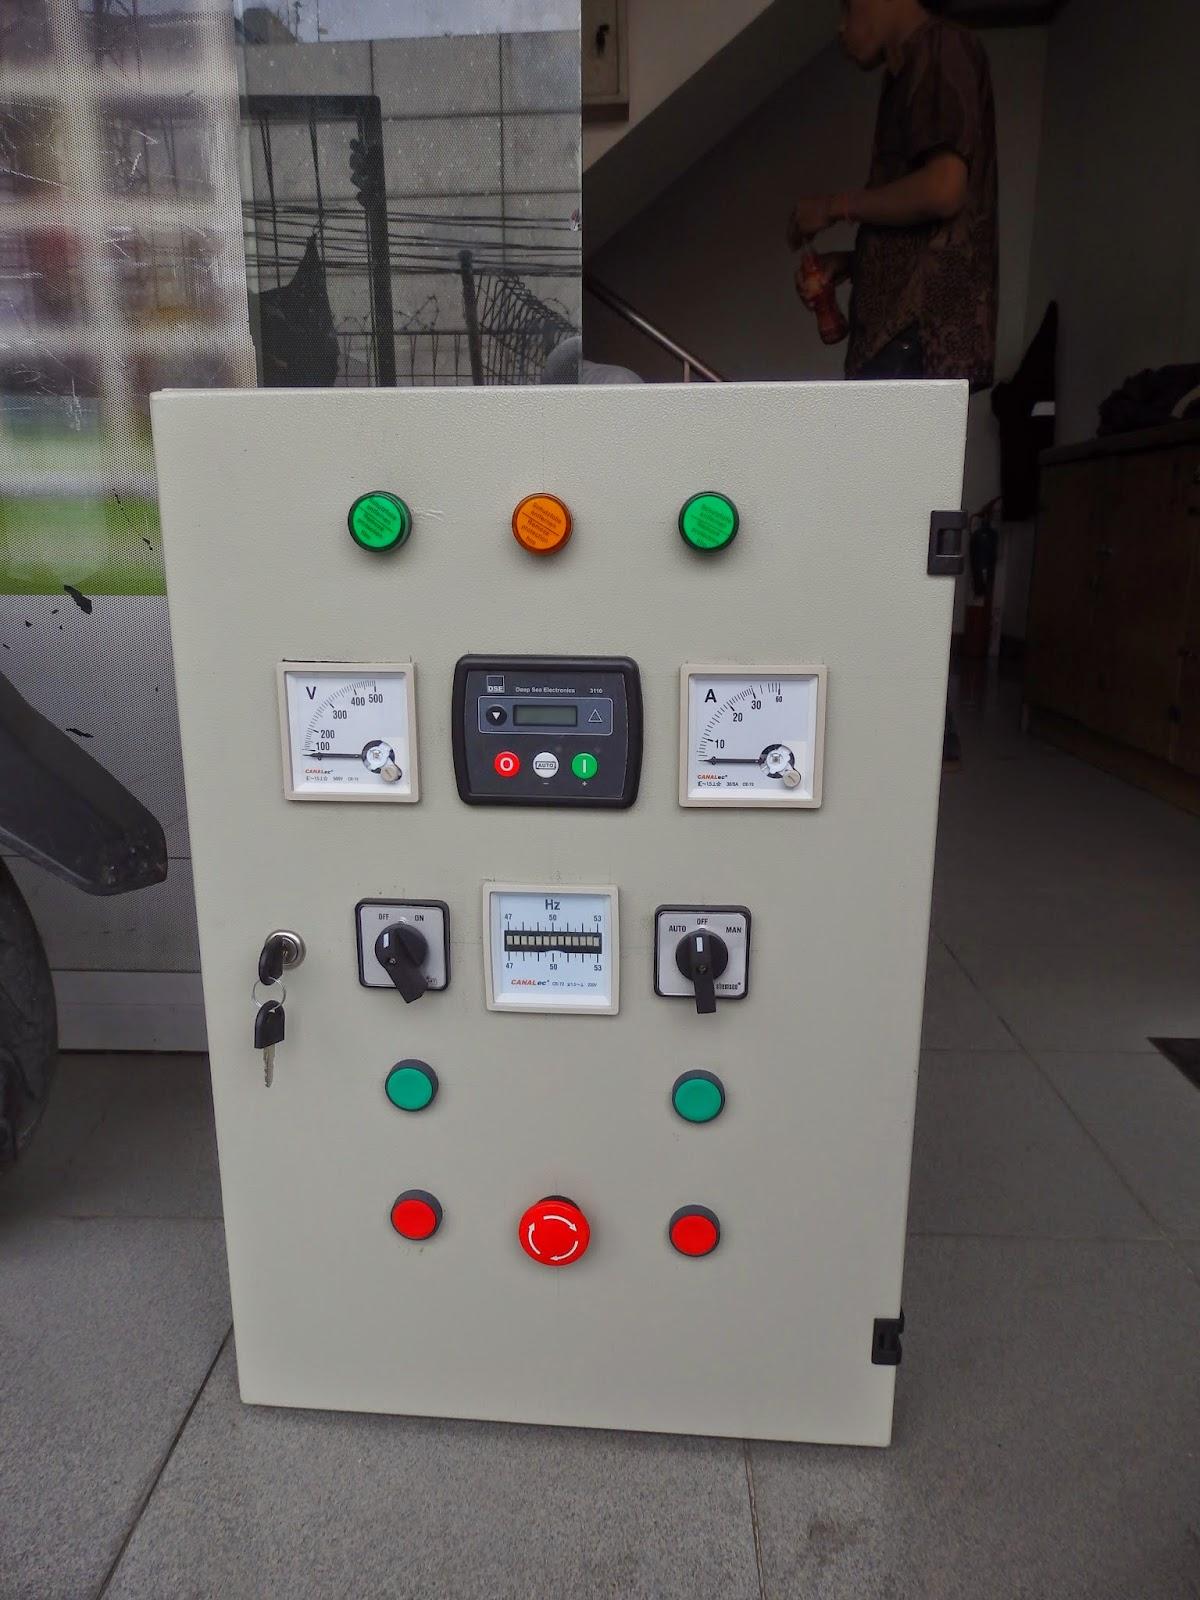 wiring diagram mccb motorized schneider 1998 ford explorer trailer ats amf 100kva ~ jaya electro mandiri panel